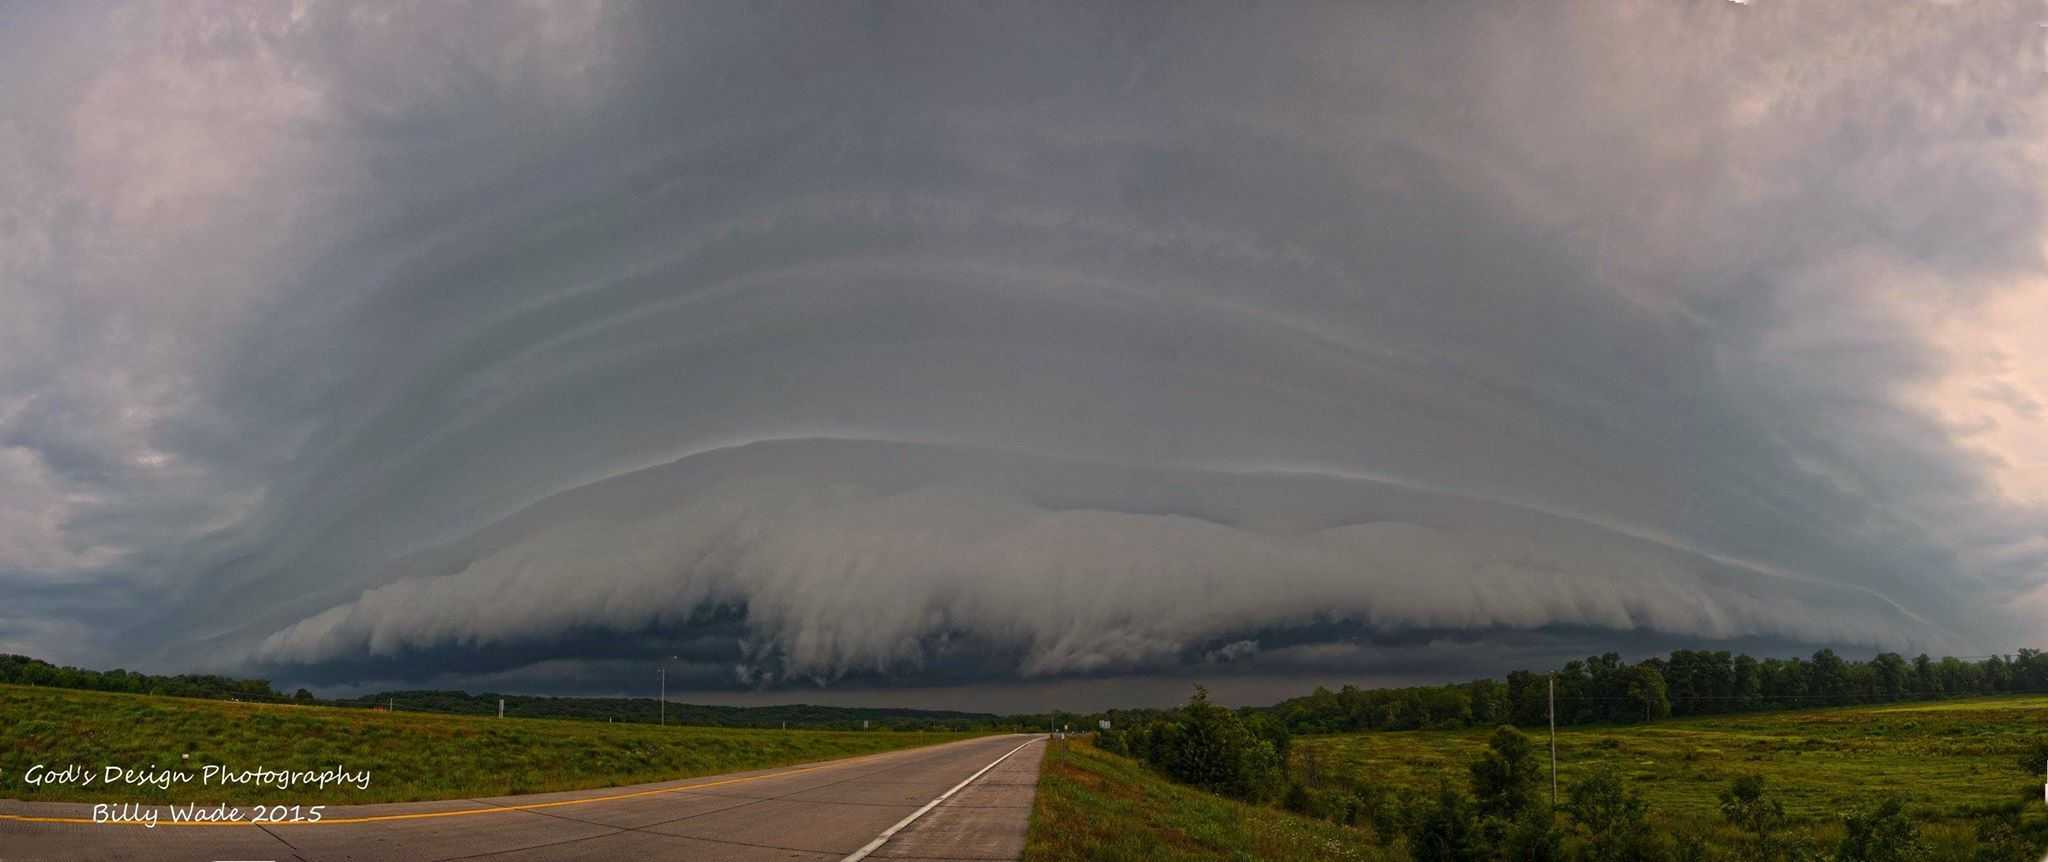 Beautiful shelf cloud here in Joplin mo, a few days ago!!!!!!